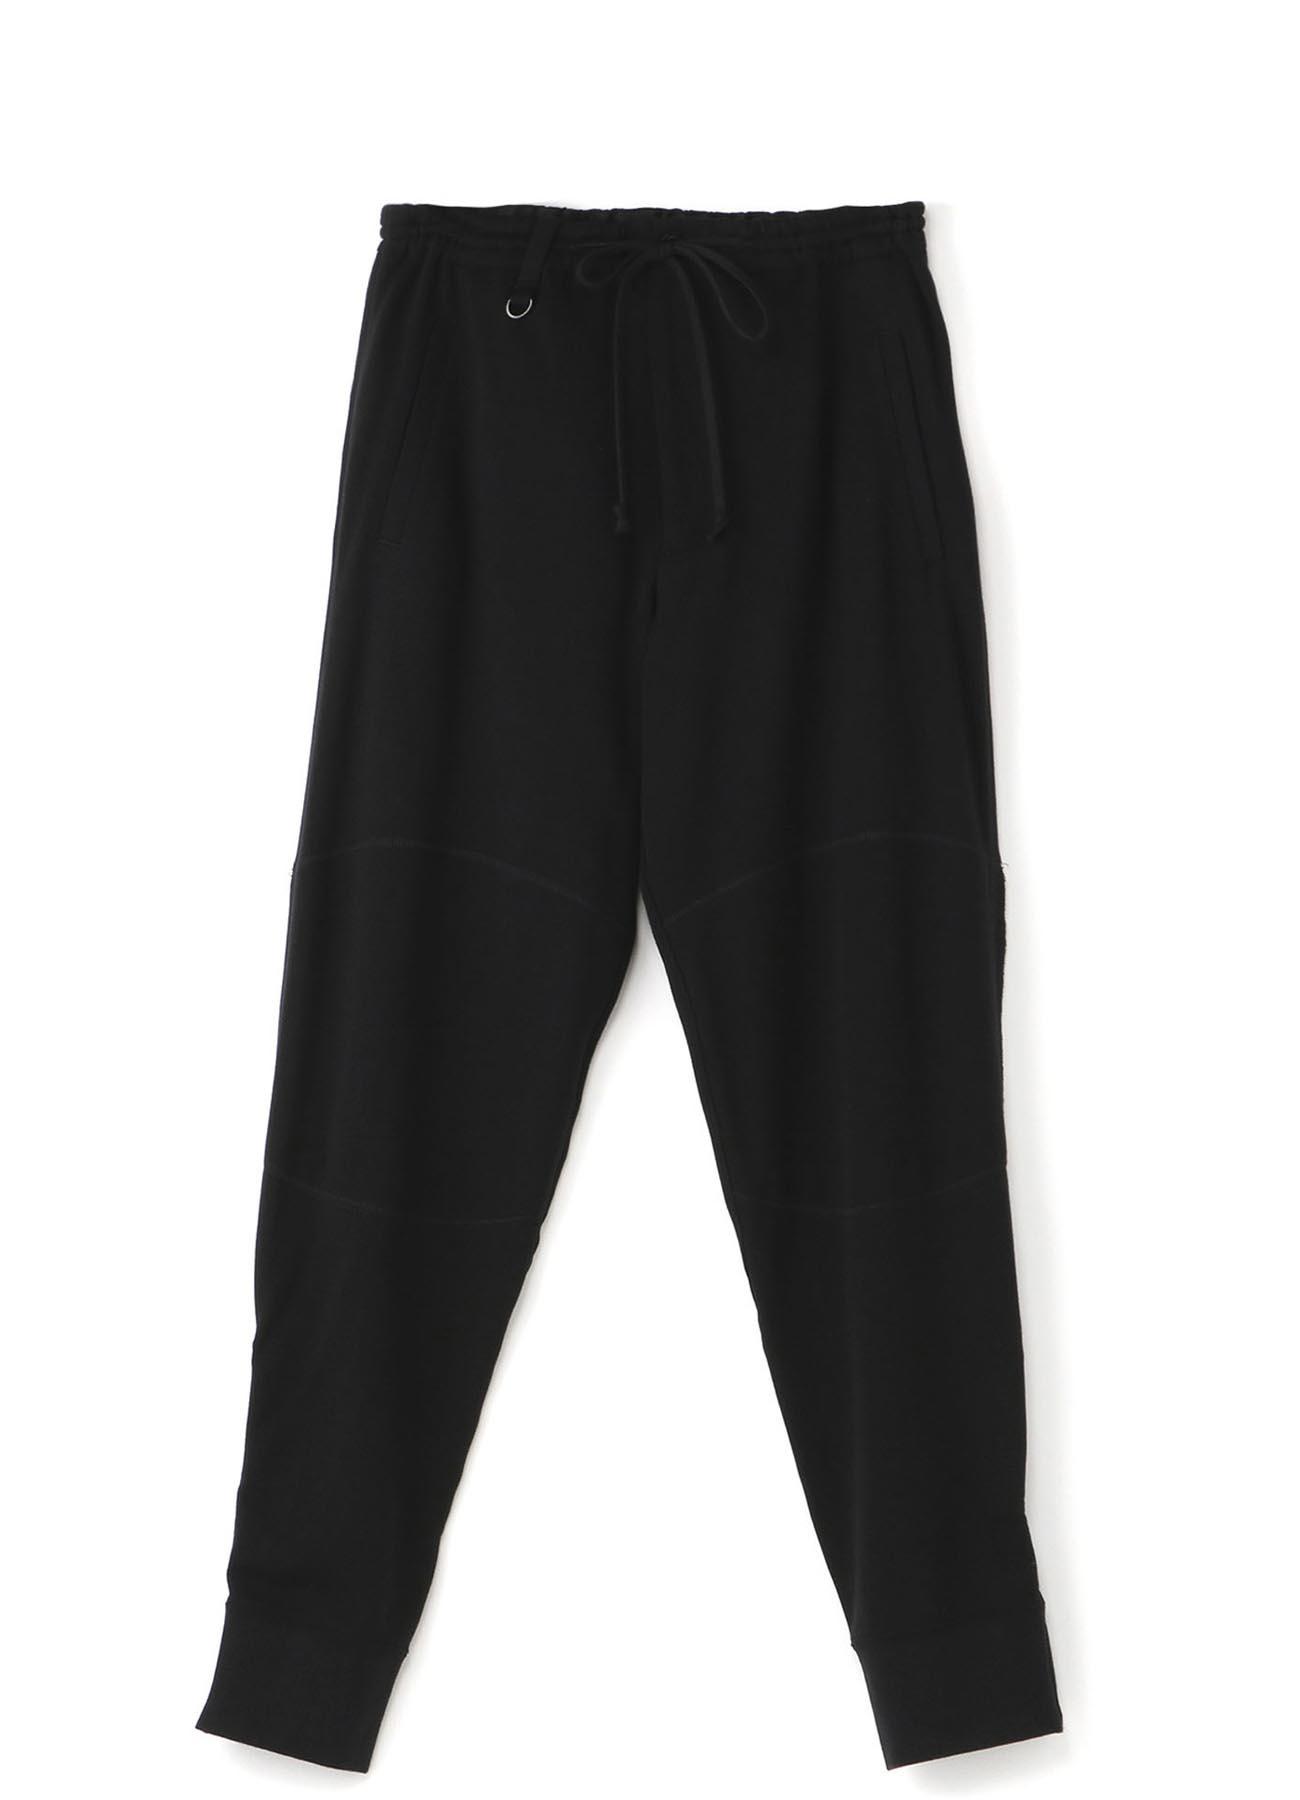 40/20 Fleecy stitch Hem zip pants